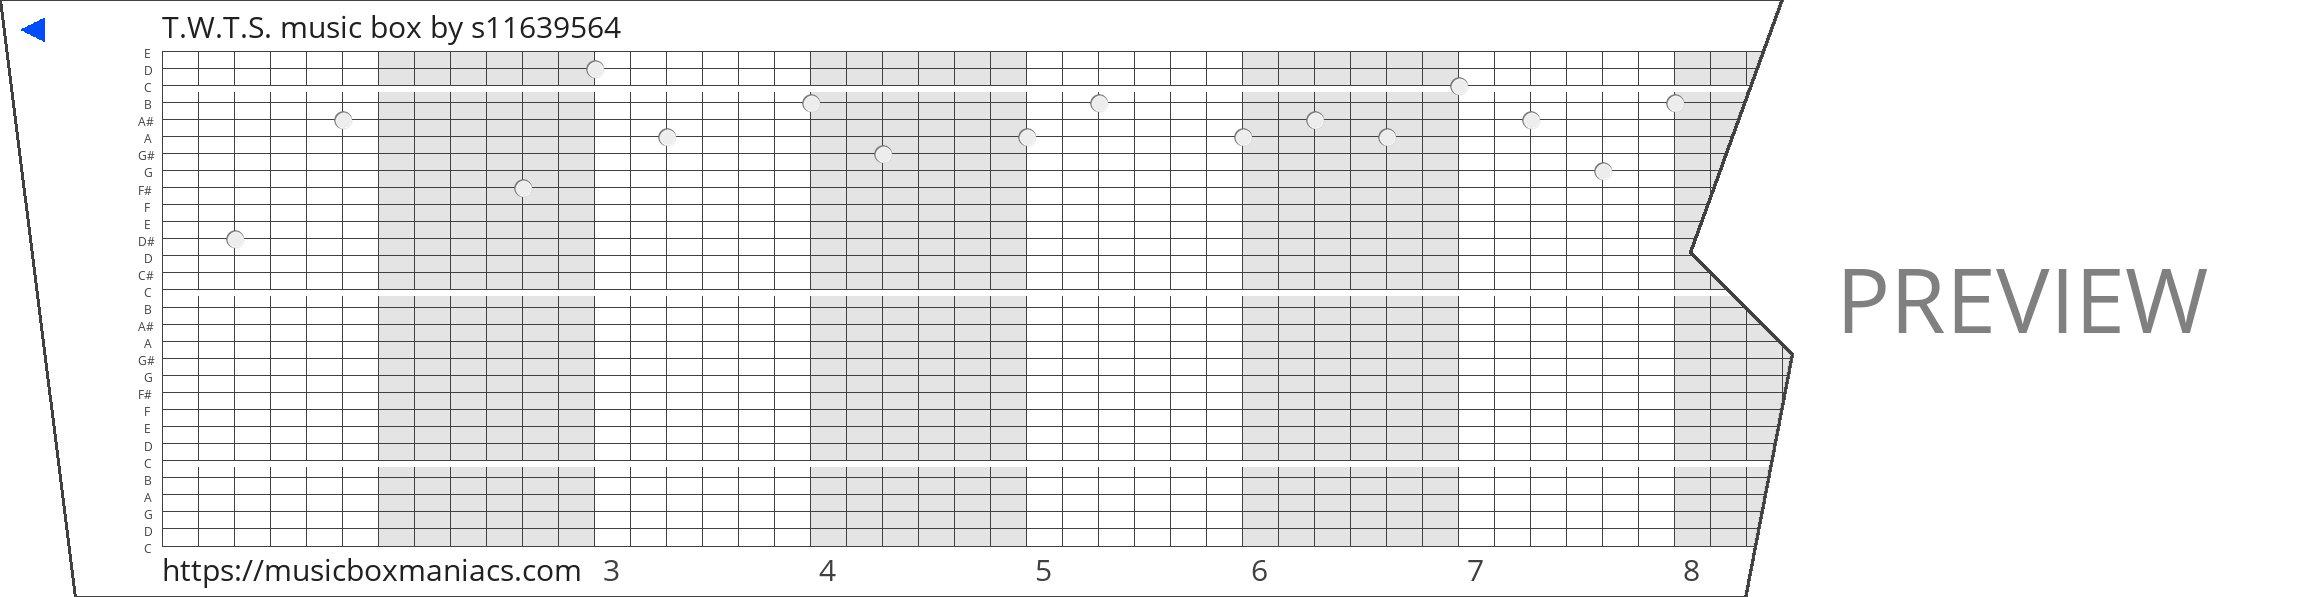 T.W.T.S. music box 30 note music box paper strip